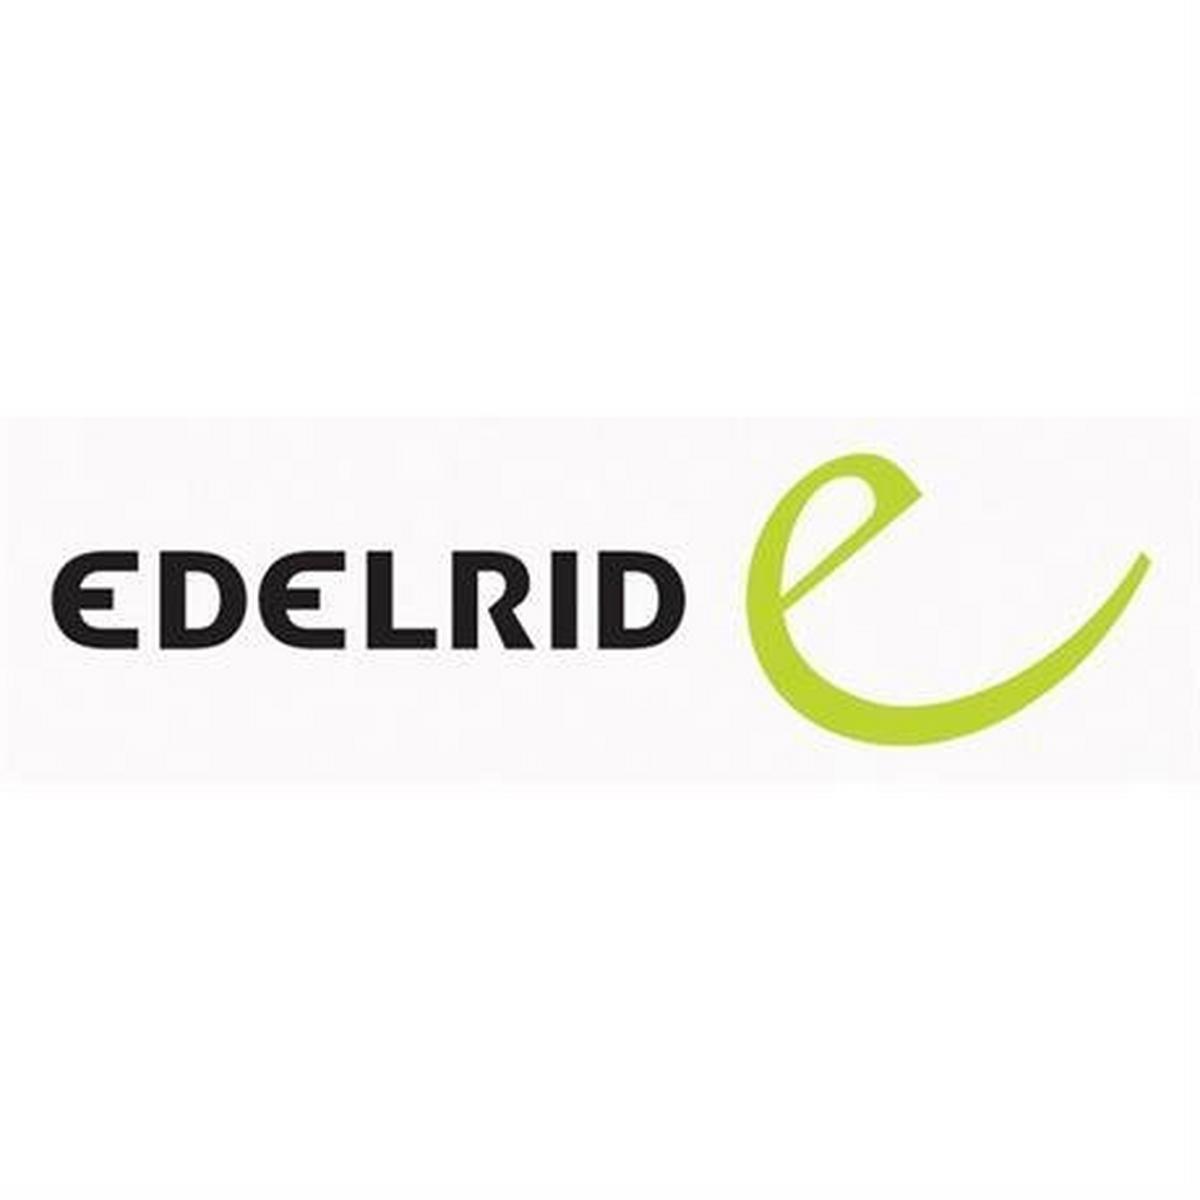 Edelrid Accessory Cord 2.5 mm Multicord Sahara